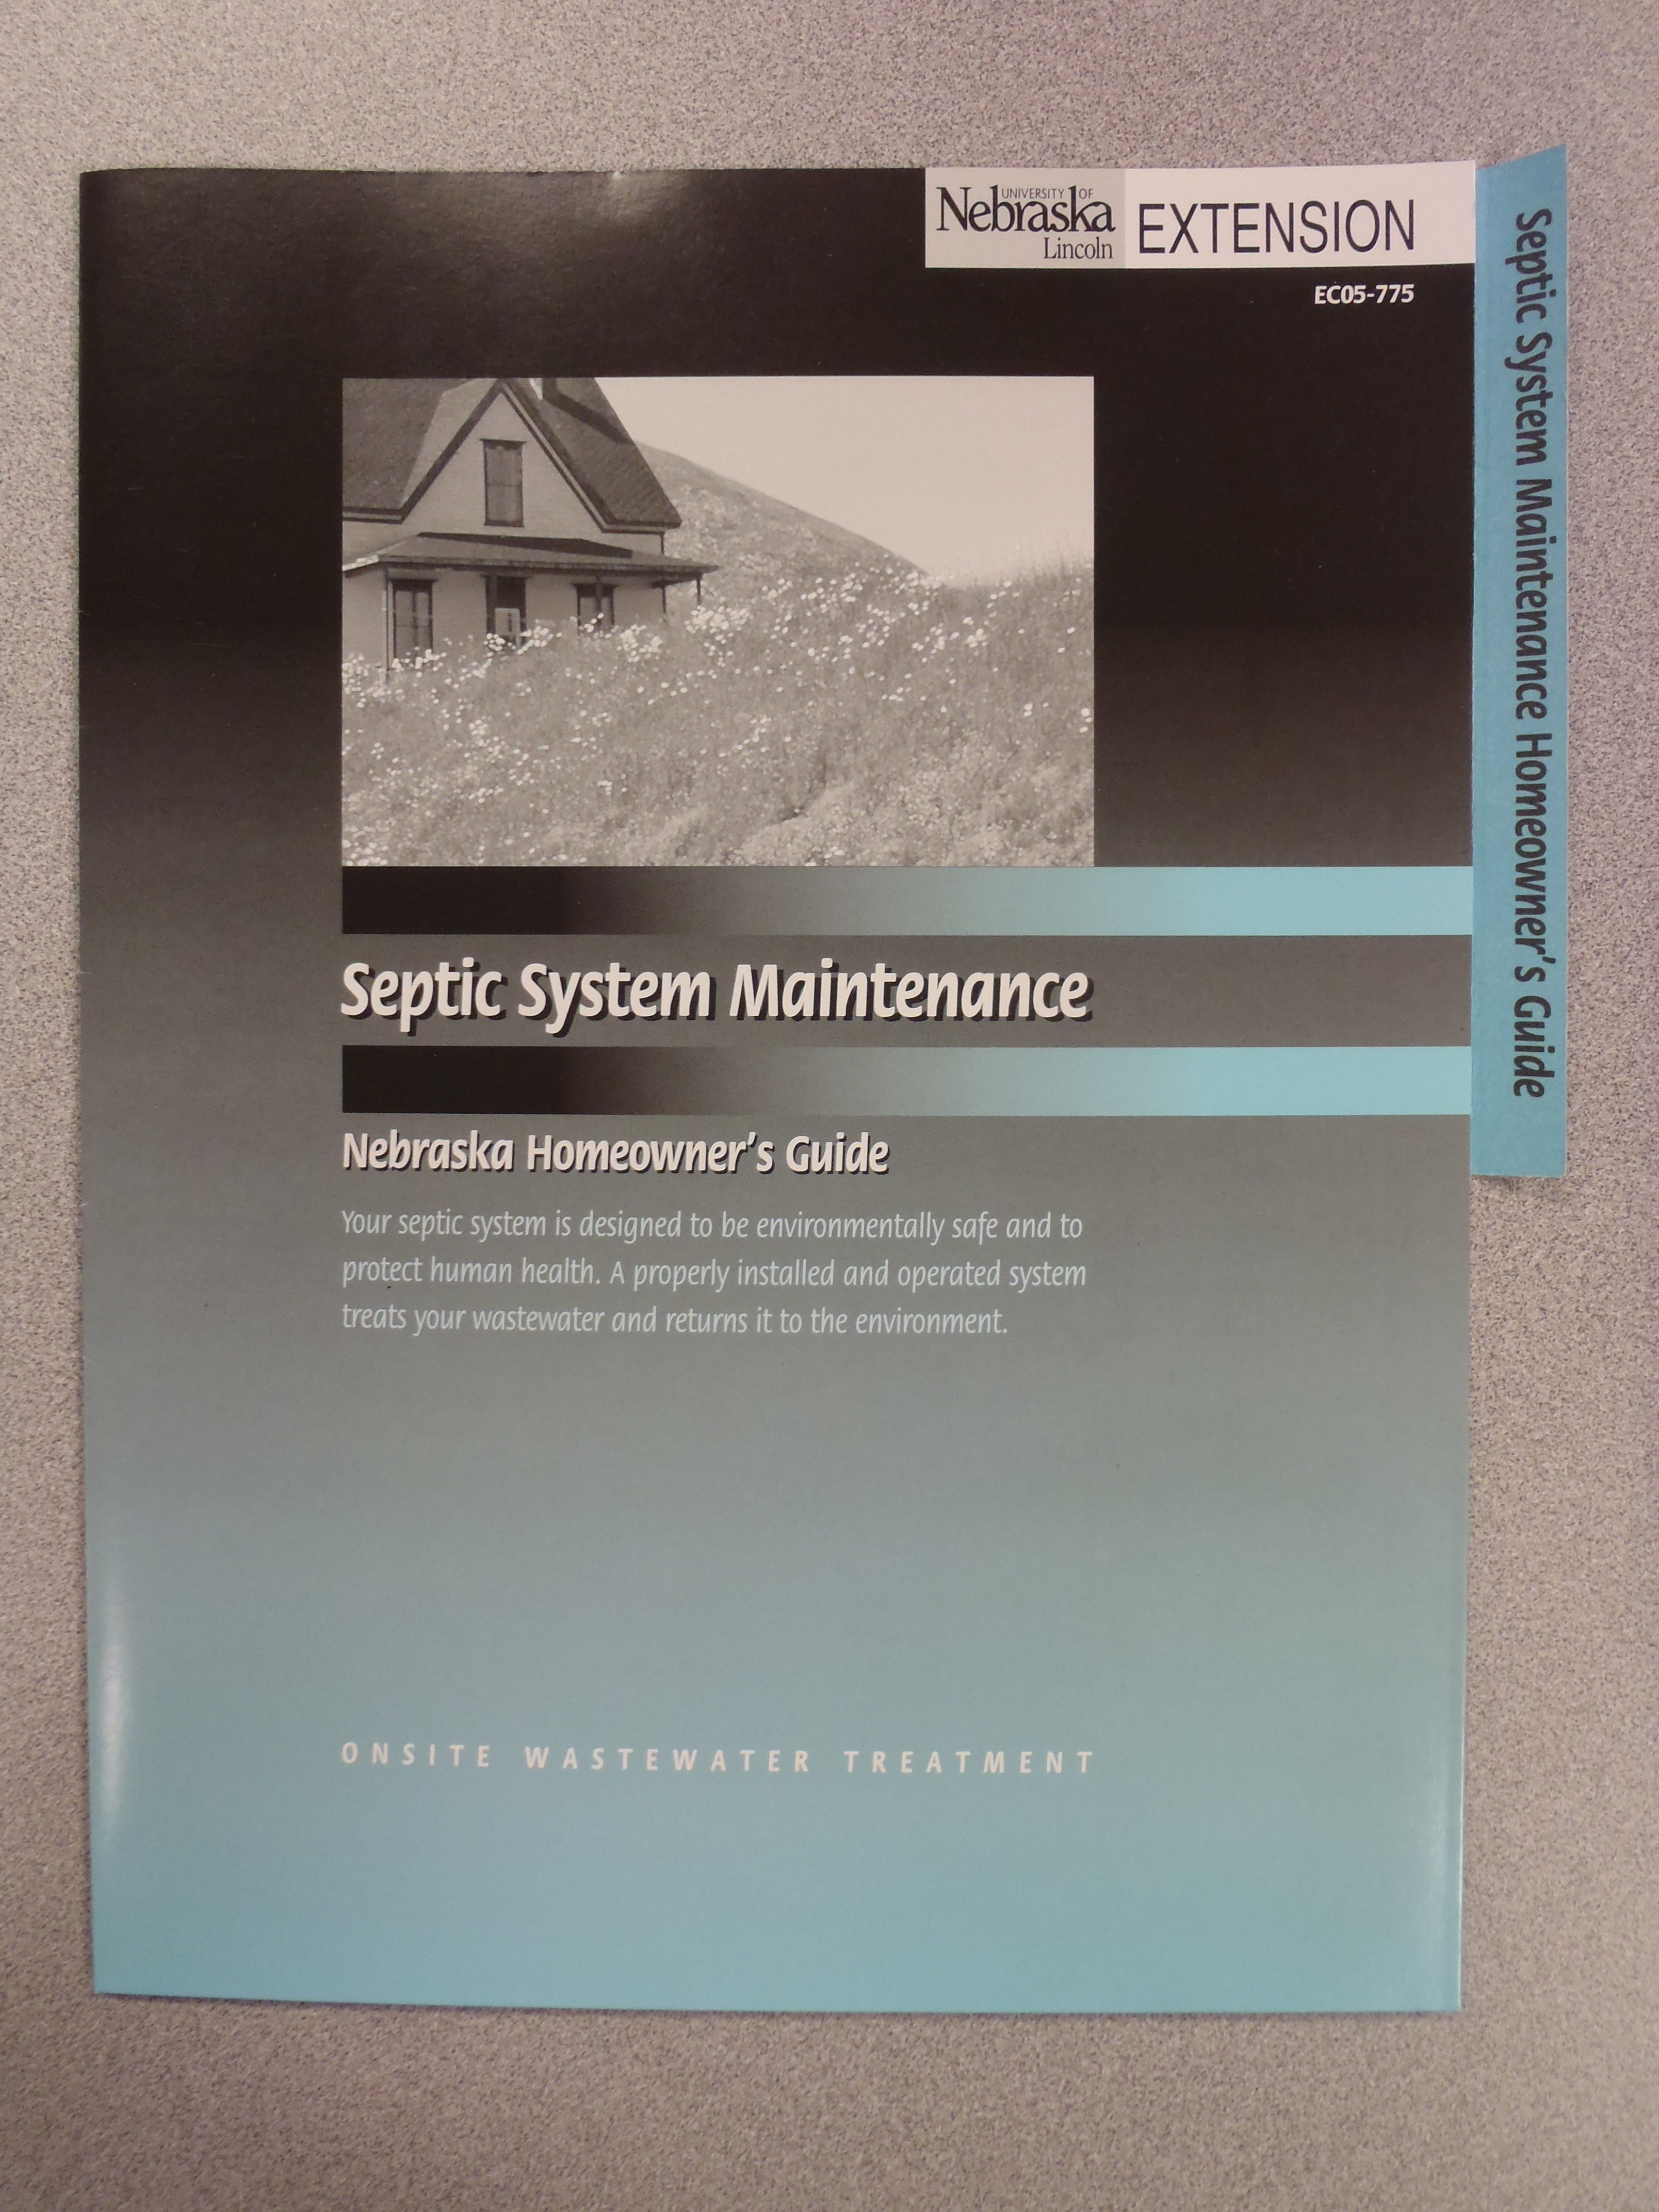 Septic System Maintenance Folder